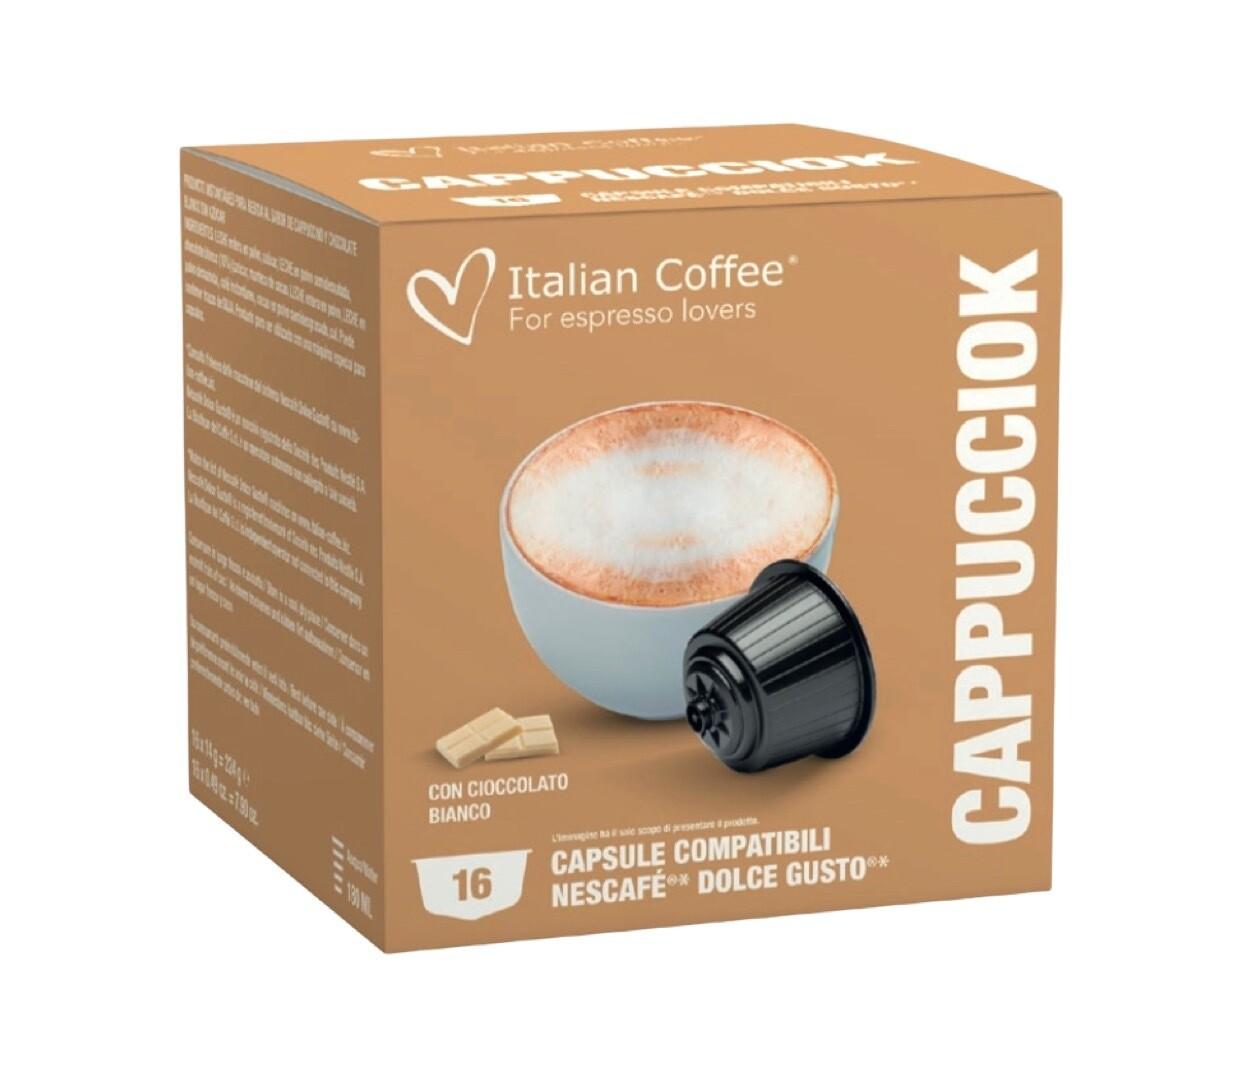 Italian Coffee™️Dolce Gusto Cappuciok CAPPUCCINO/latte со Бело Чоколадо